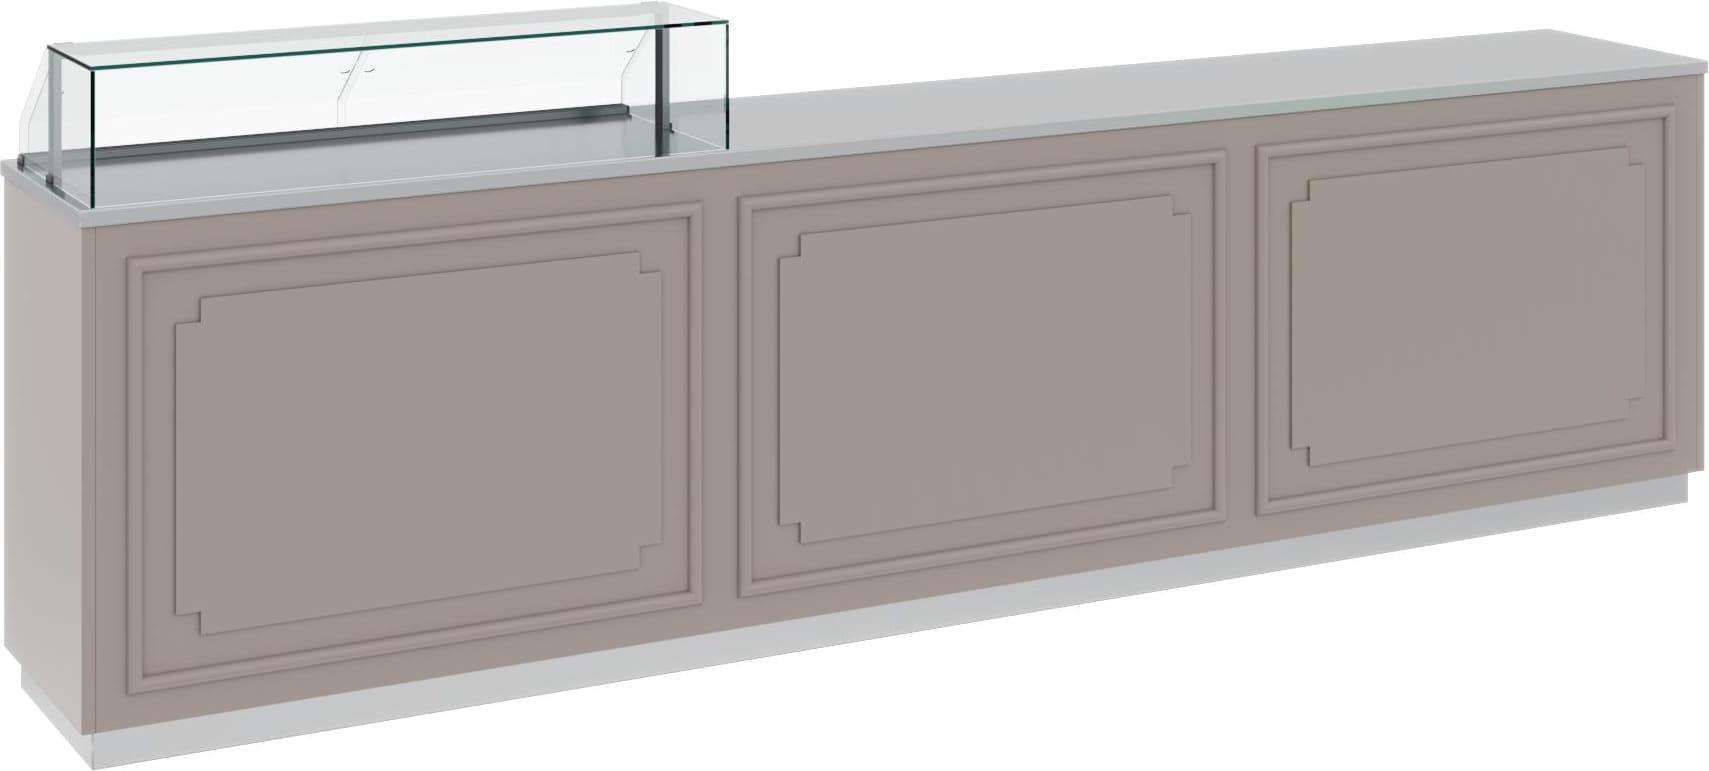 Нейтральная витрина CARBOMA OMI AC40N 1.25-1 - 1